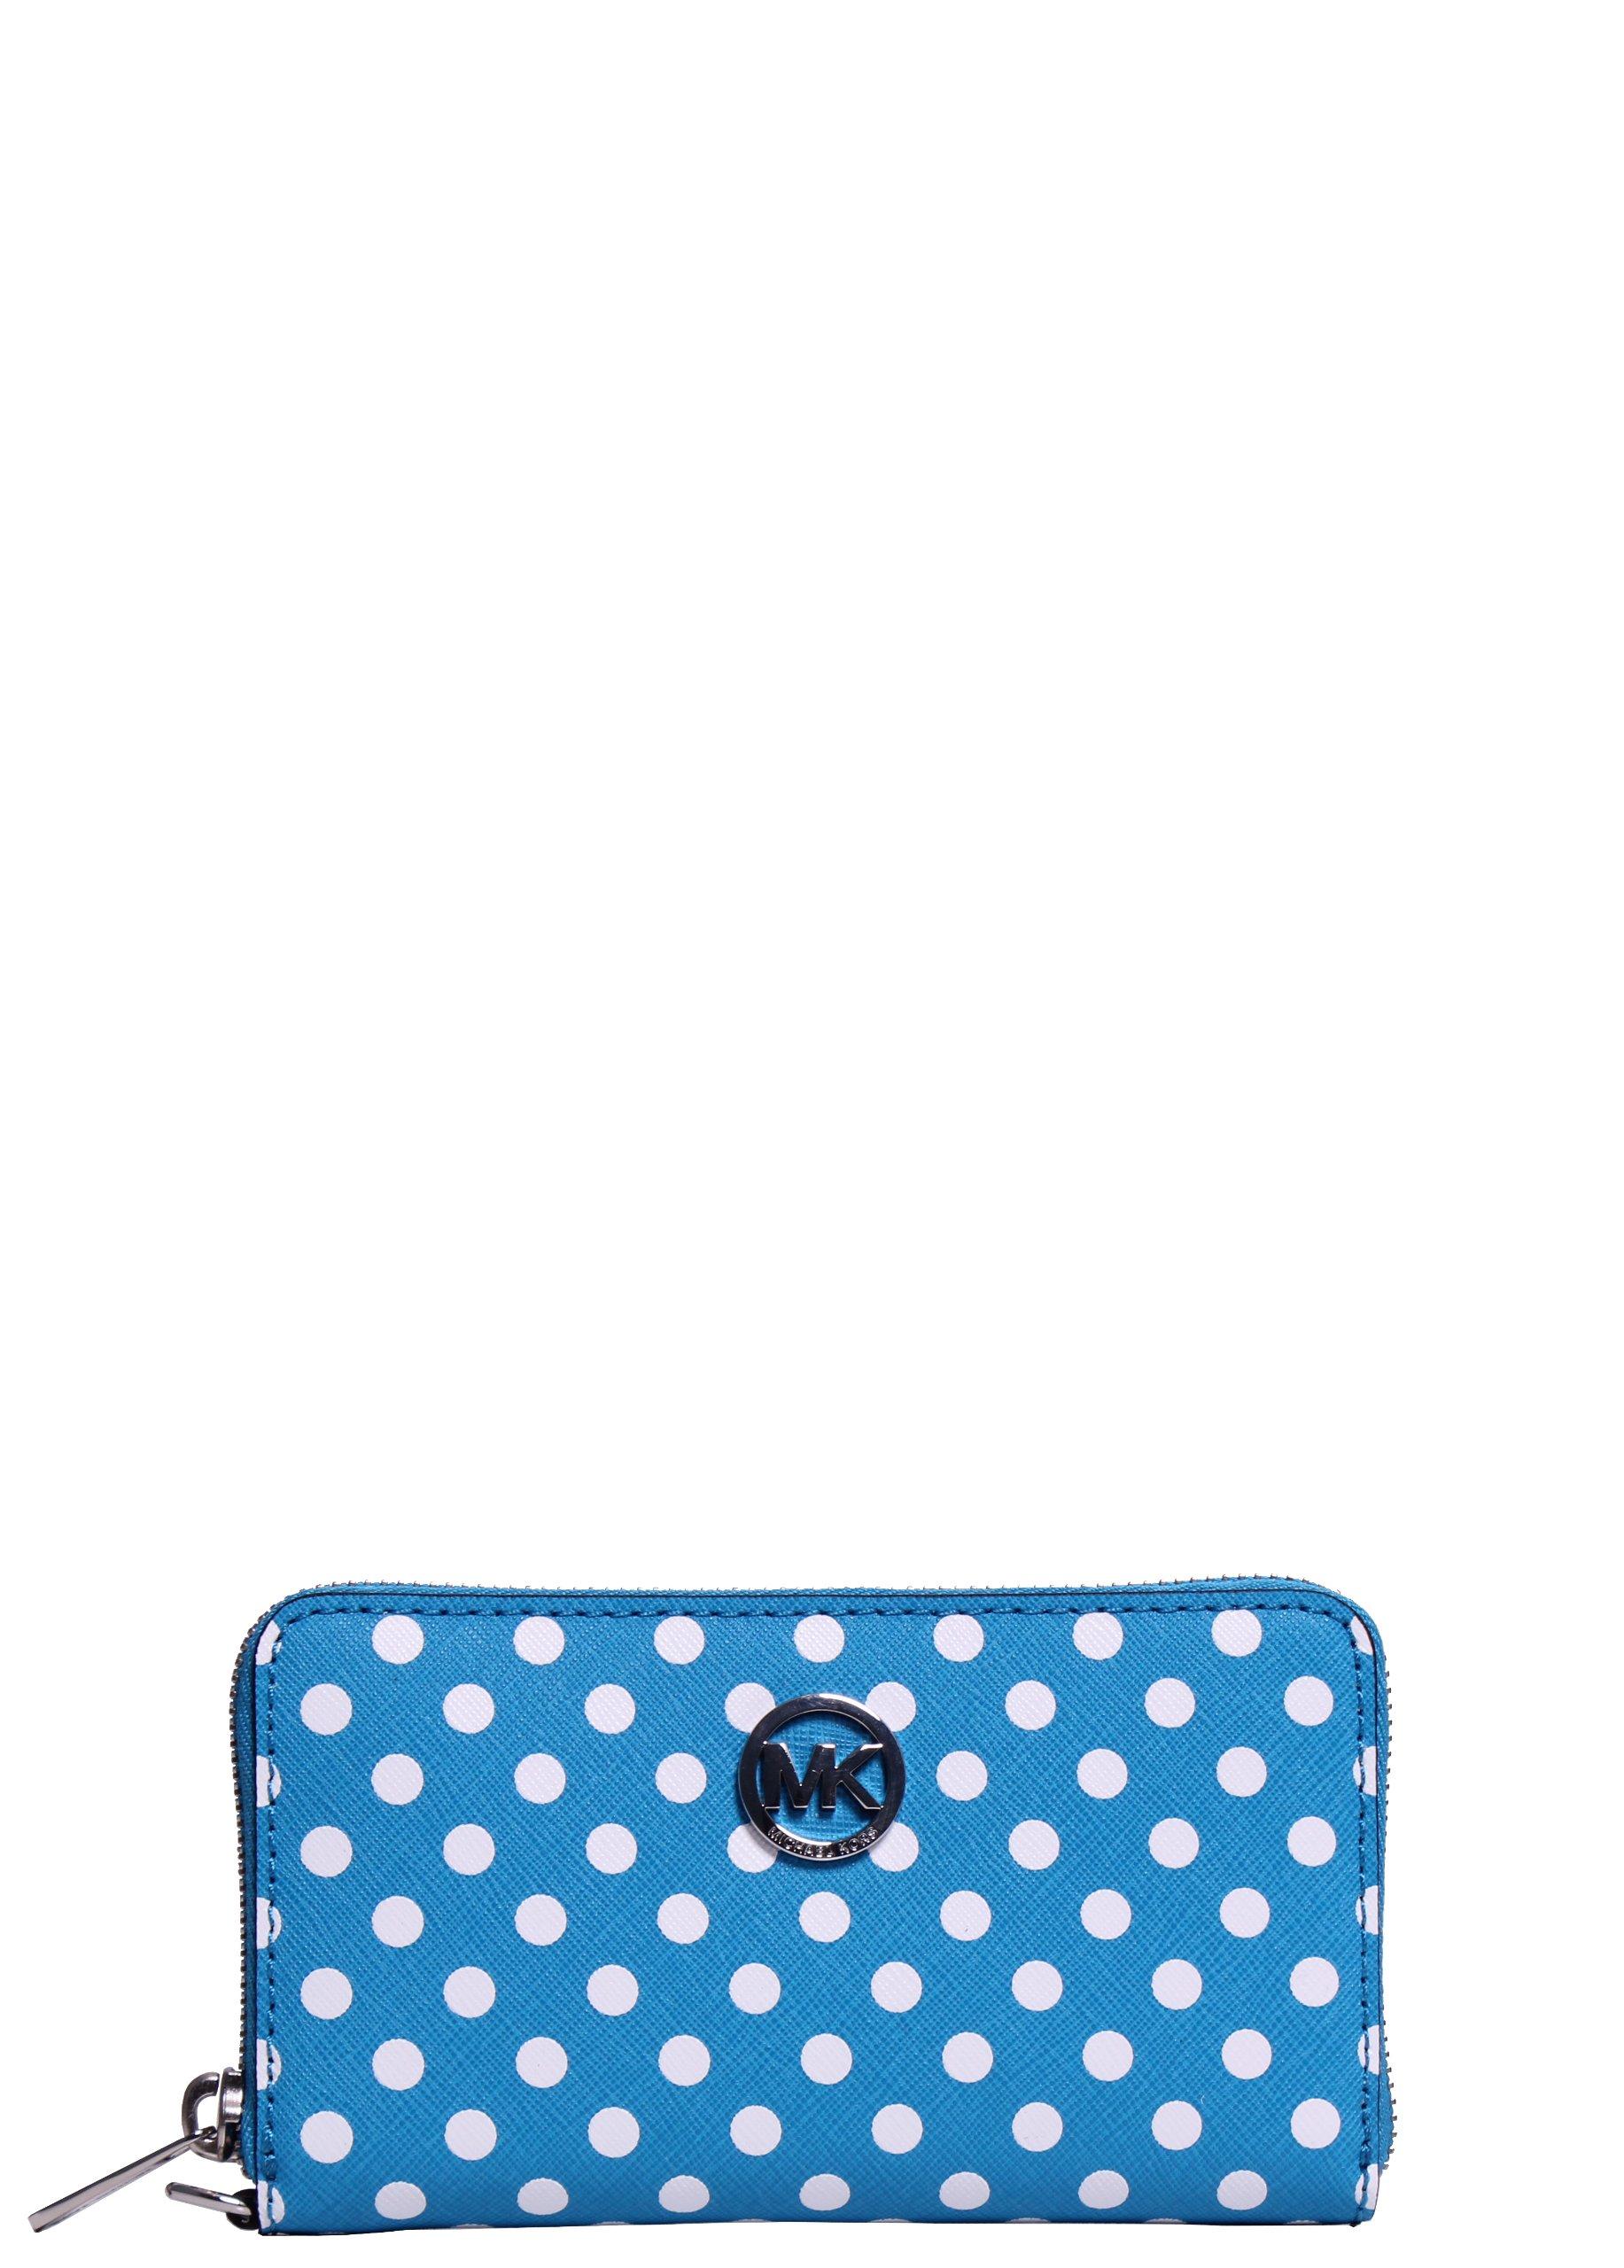 Michael Kors Large Jet Set Travel Dot Multifunction Phone Case Wristlet in Summer Blue